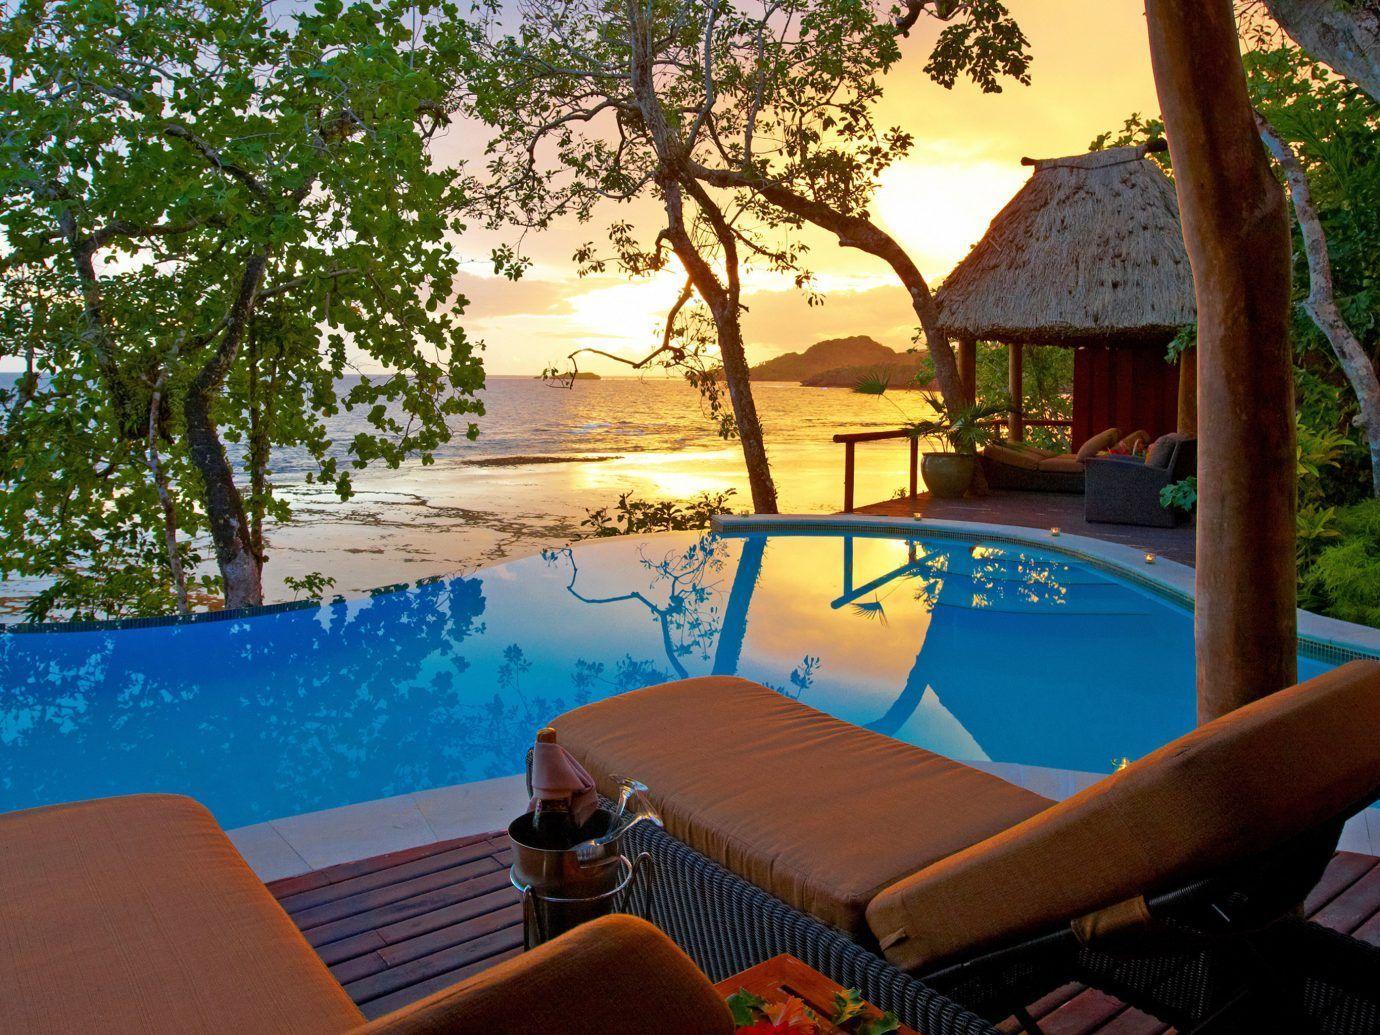 The 9 BEST AllInclusive Resorts in Fiji 2019  Best